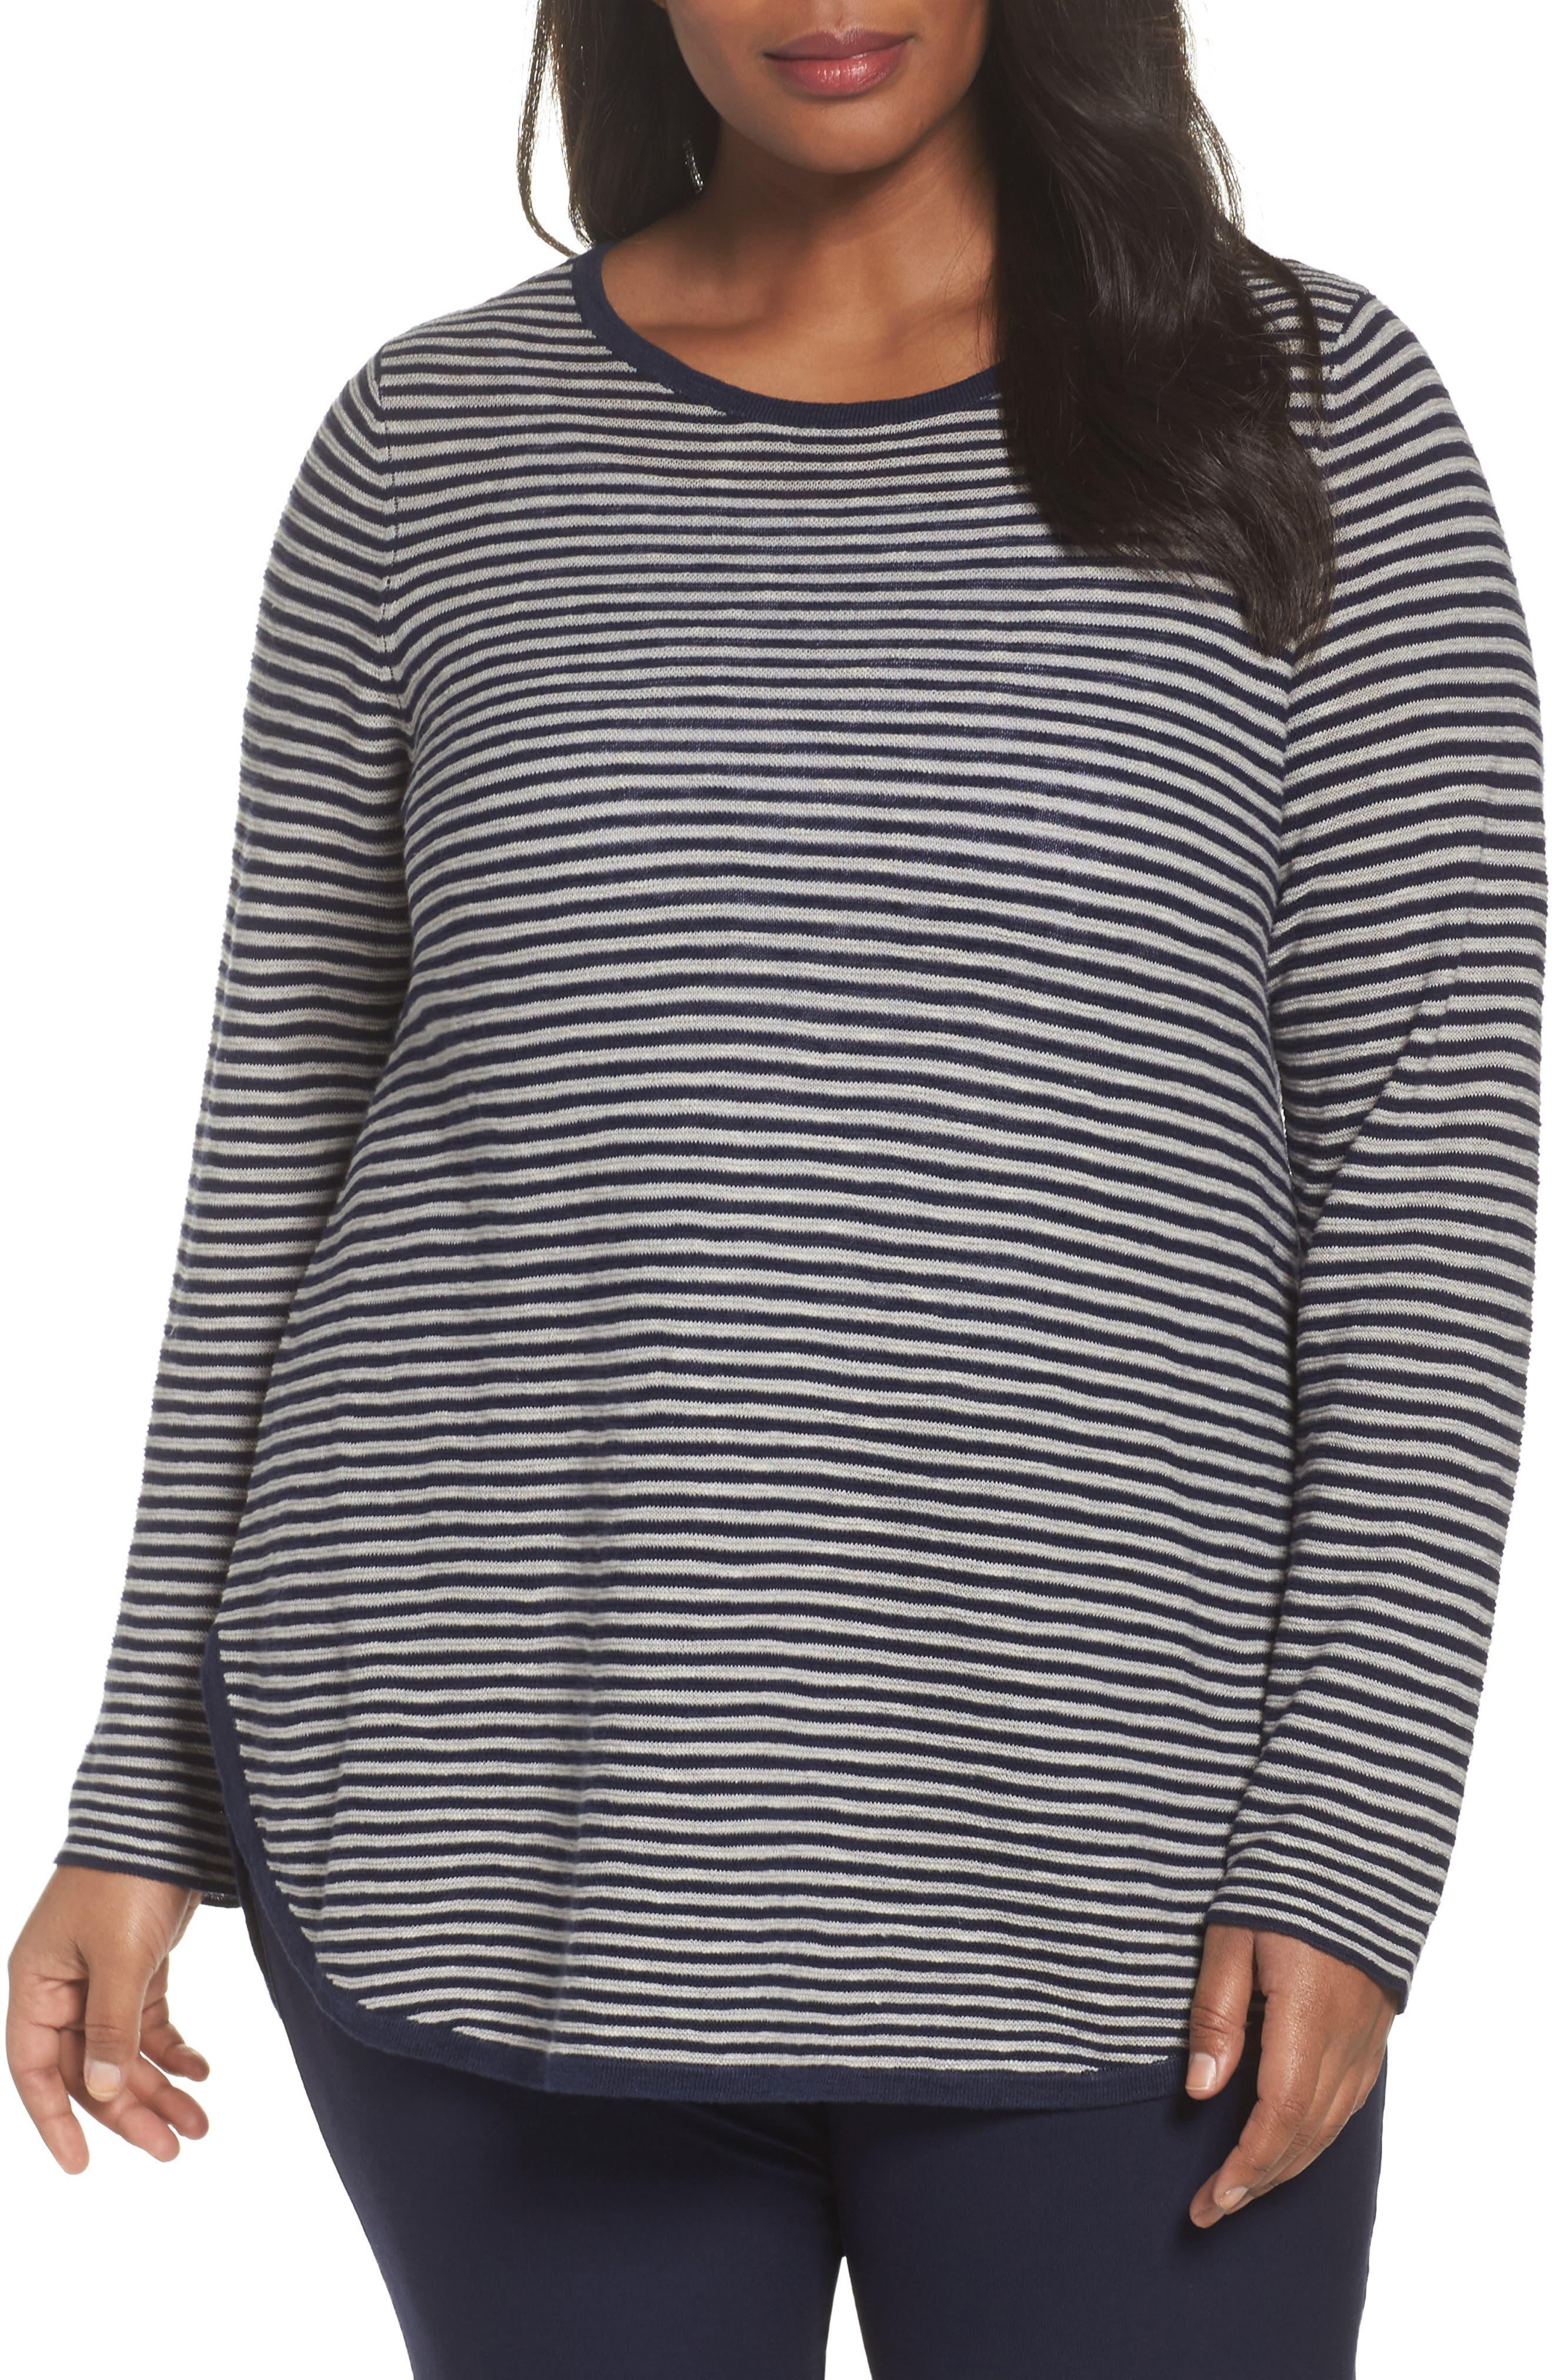 Main Image - Eileen Fisher Stripe Organic Linen & Cotton Sweater (Plus Size)